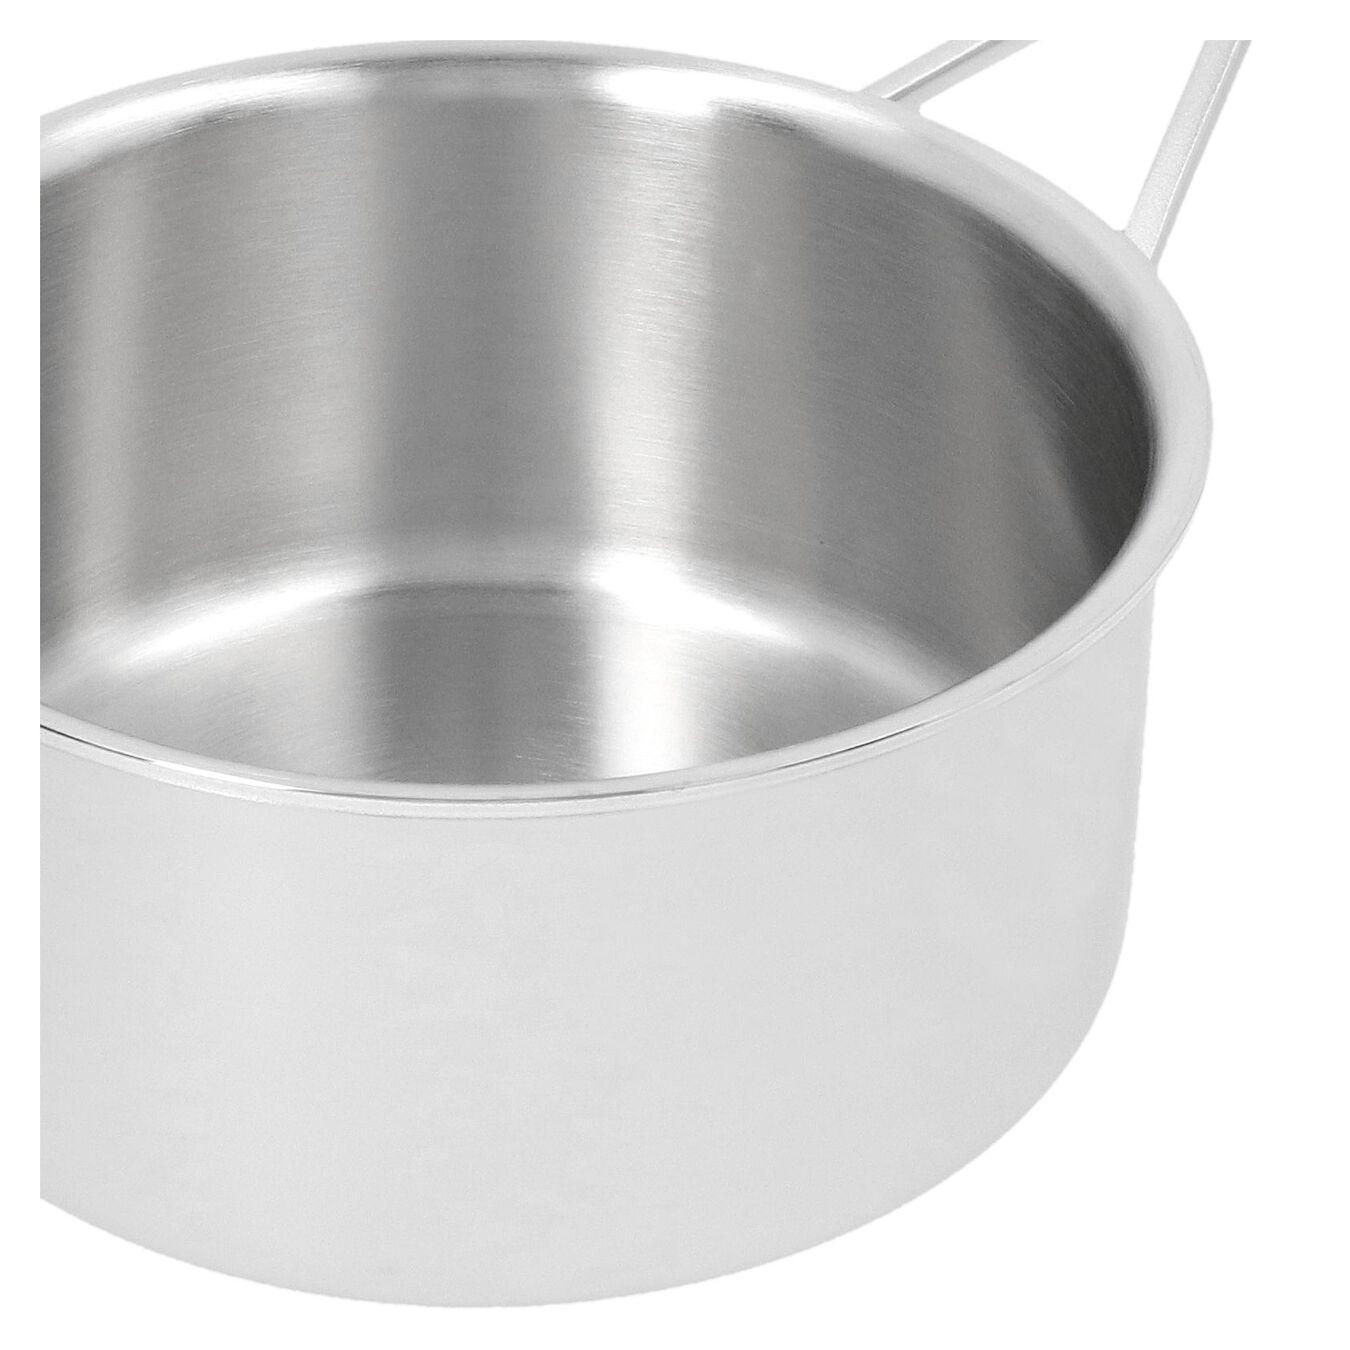 Stieltopf ohne Deckel 18 cm, 18/10 Edelstahl, Silber,,large 5